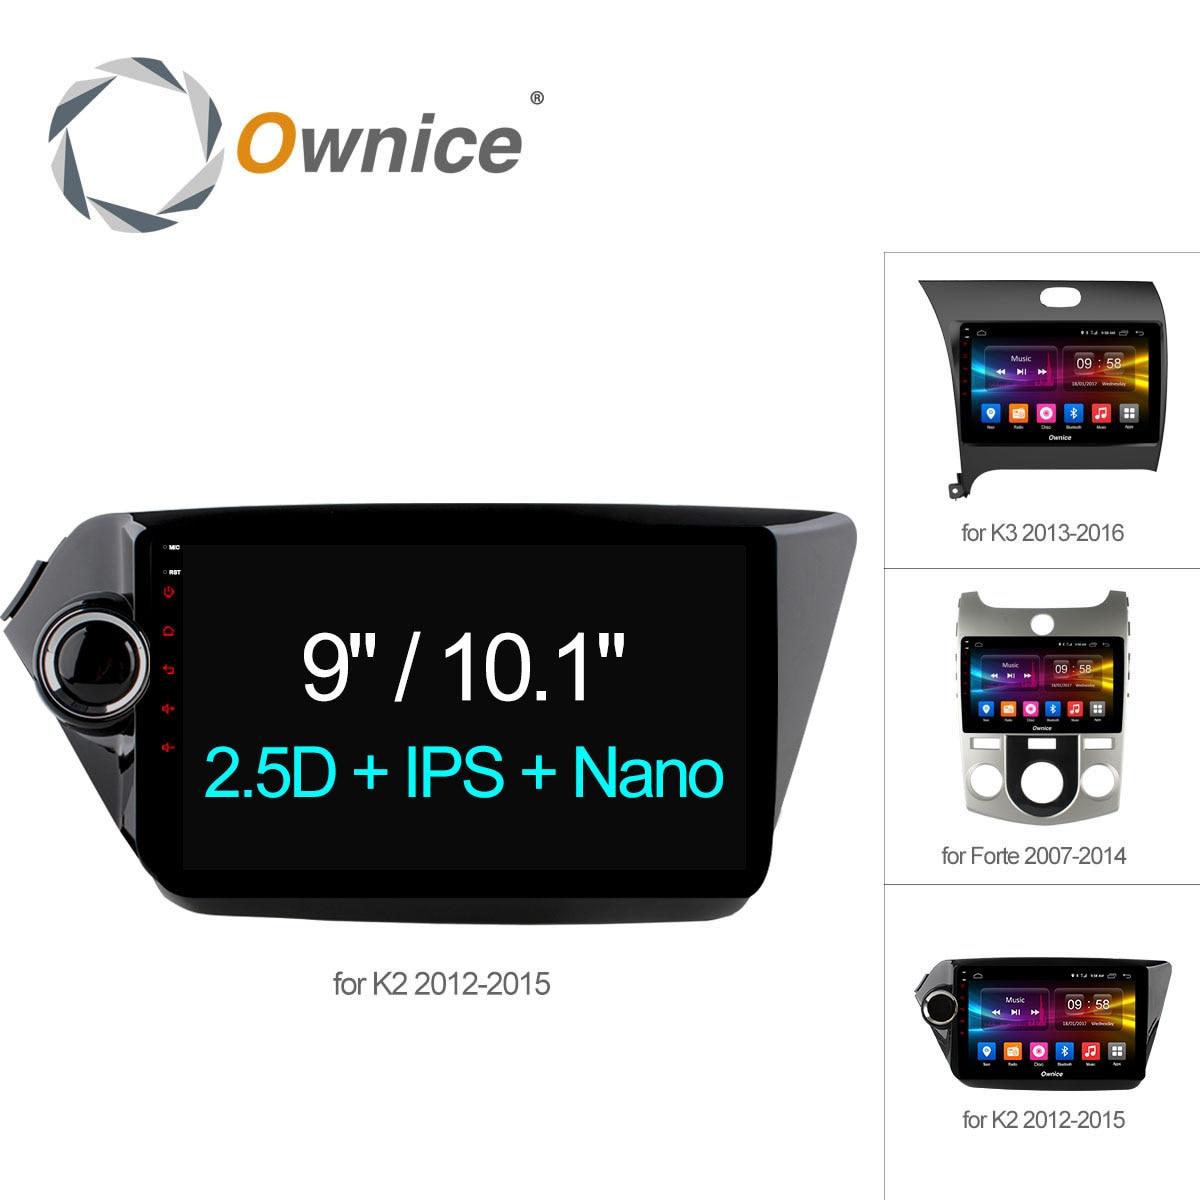 Ownice C500 + Android 6.0 Octa 8 Núcleo jogador rádio do carro GPS navi DVD para Kia k2 K3 Forte 2012 2G RAM 32G Apoio ROM 4G LTE DAB +